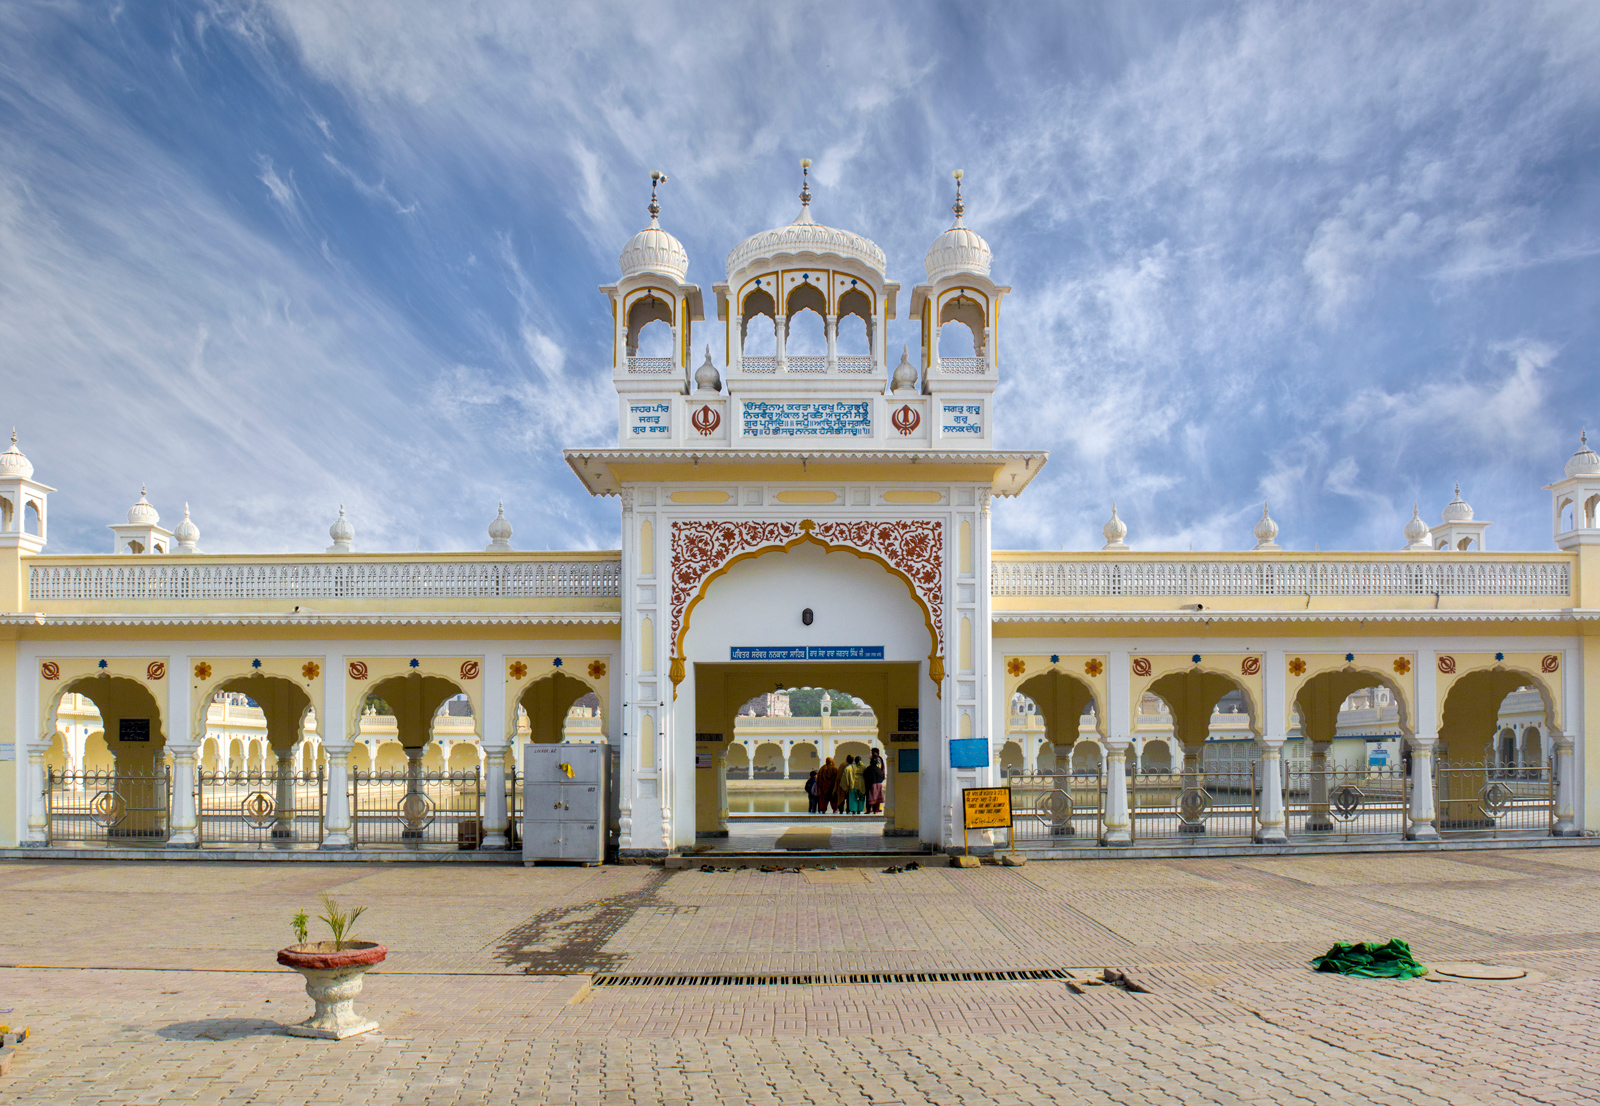 The birth city of Guru Nanak The entrance of Sarovar for